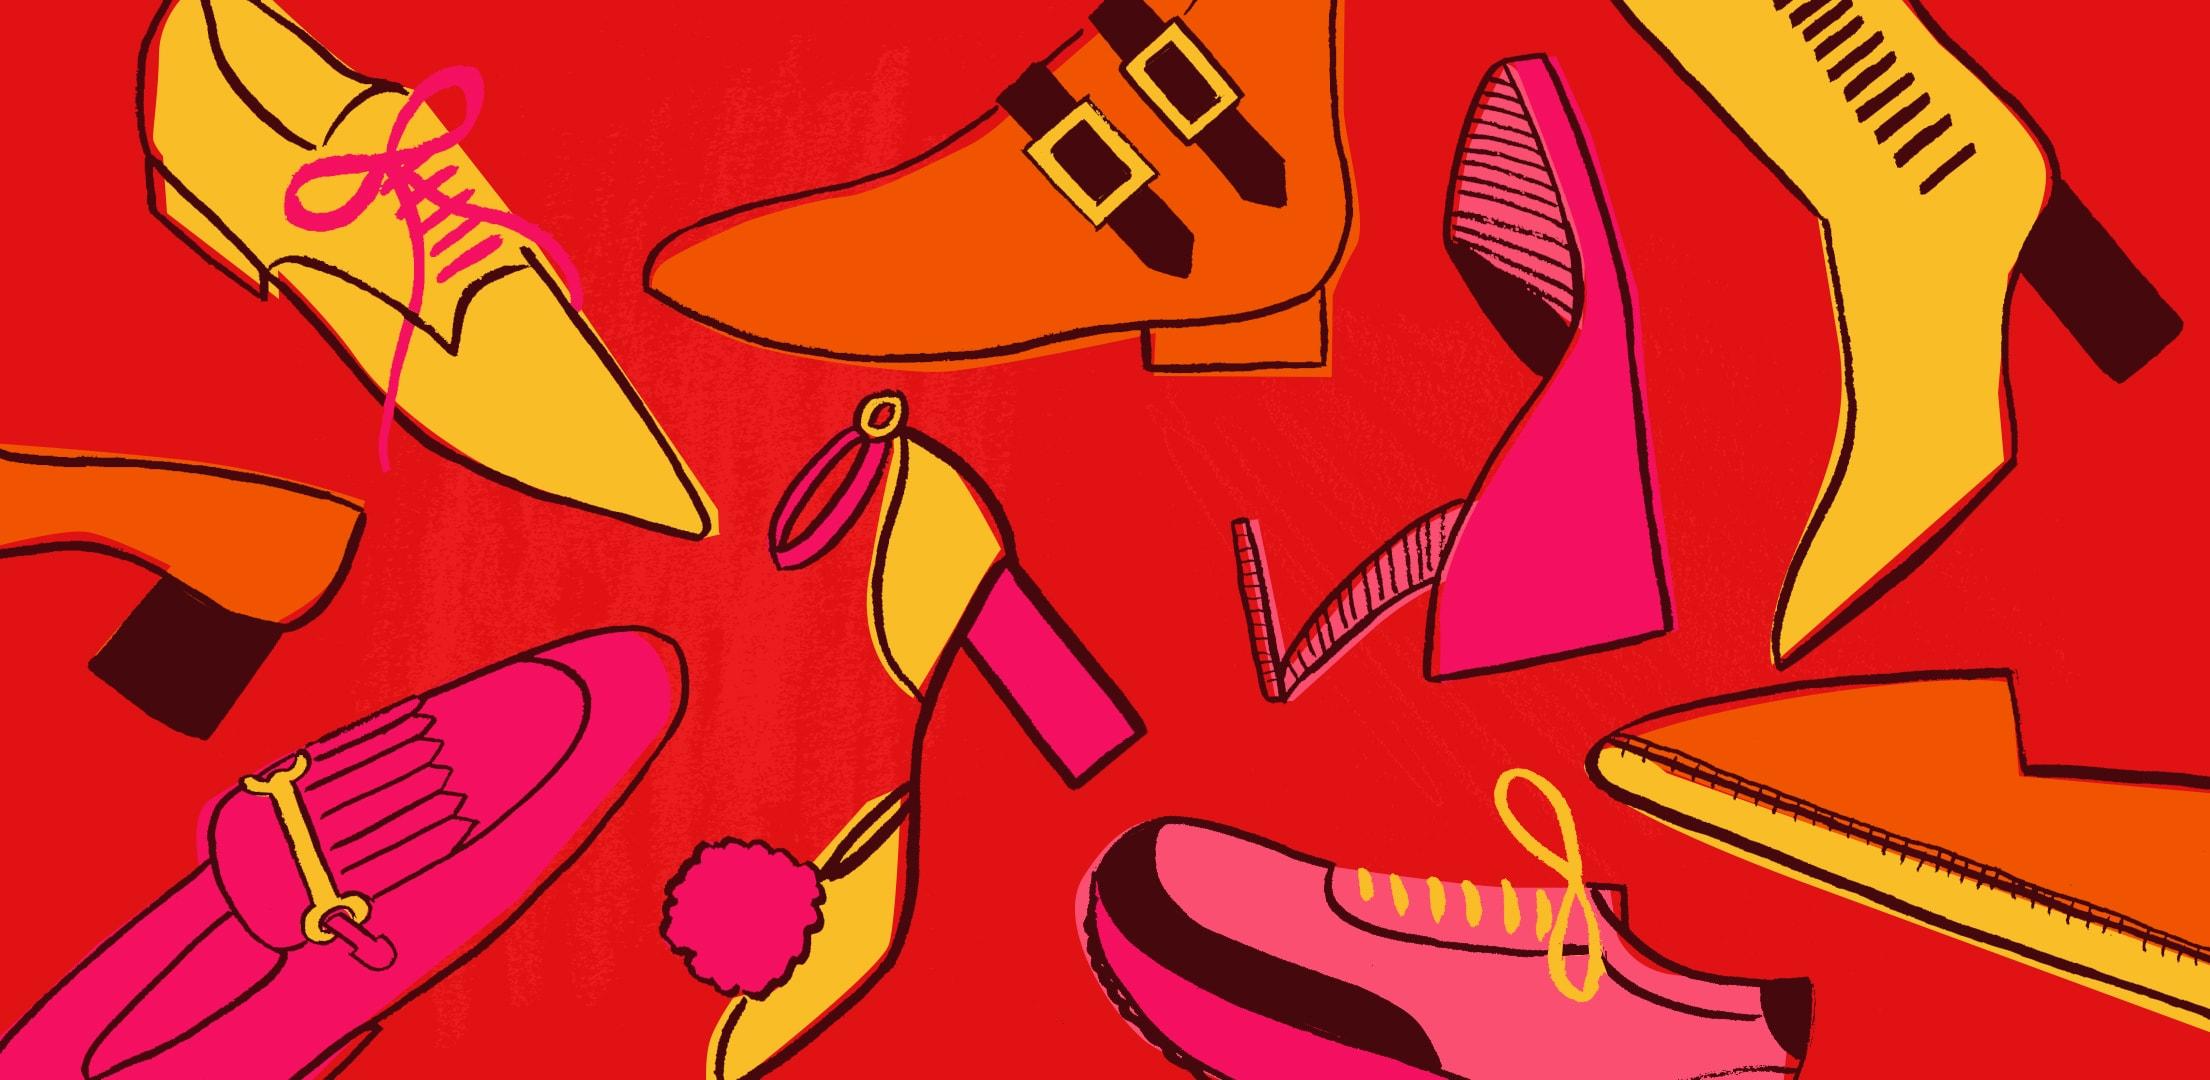 7 Spanish Designer Footwear Brands You